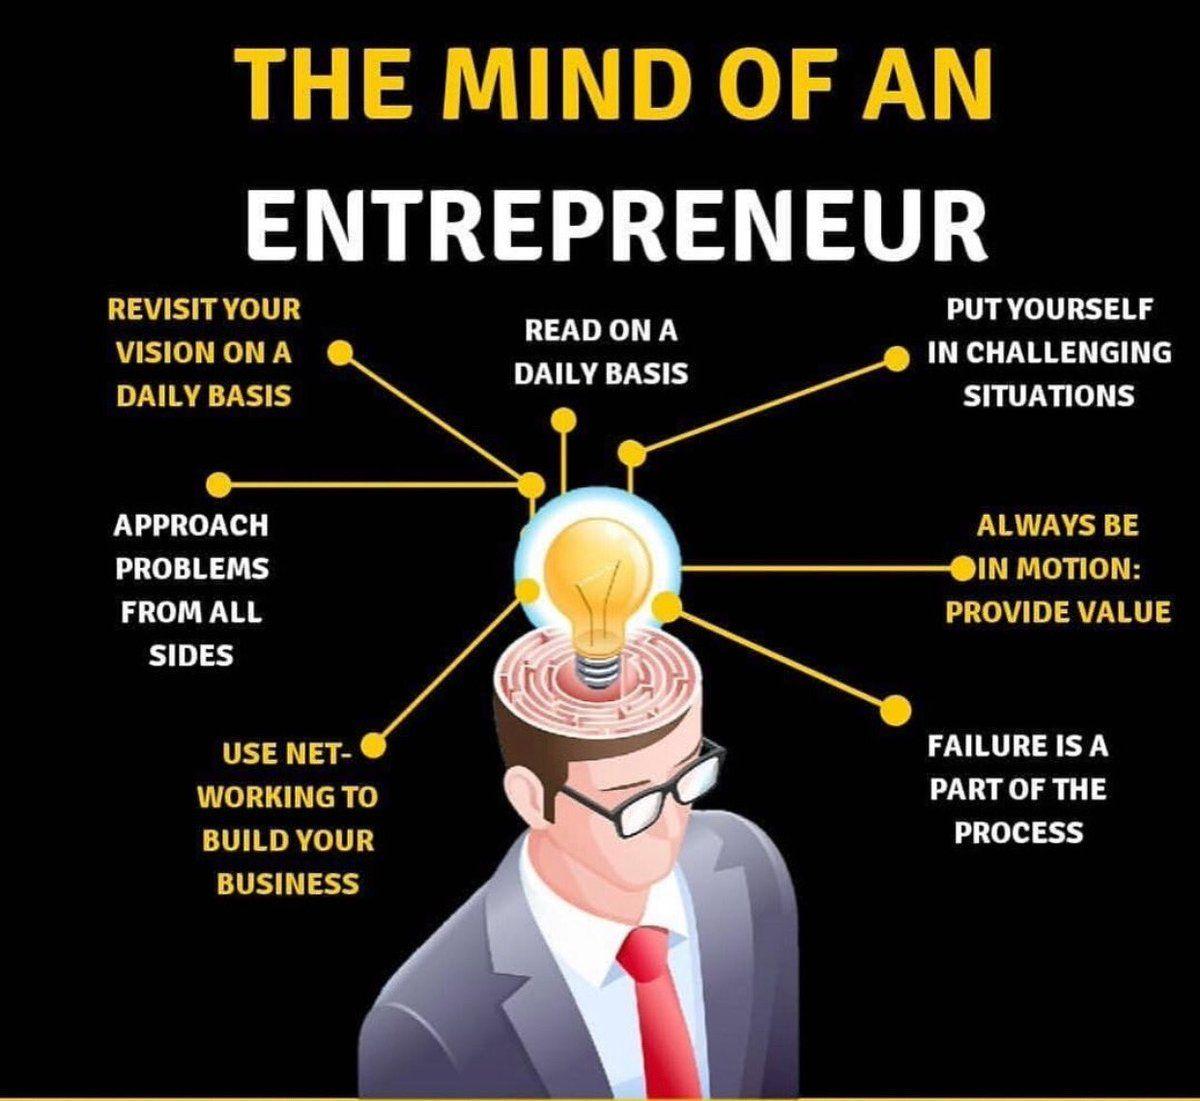 News about #entrepreneurship on Twitter | Business entrepreneur startups,  Business entrepreneurship, Money management advice